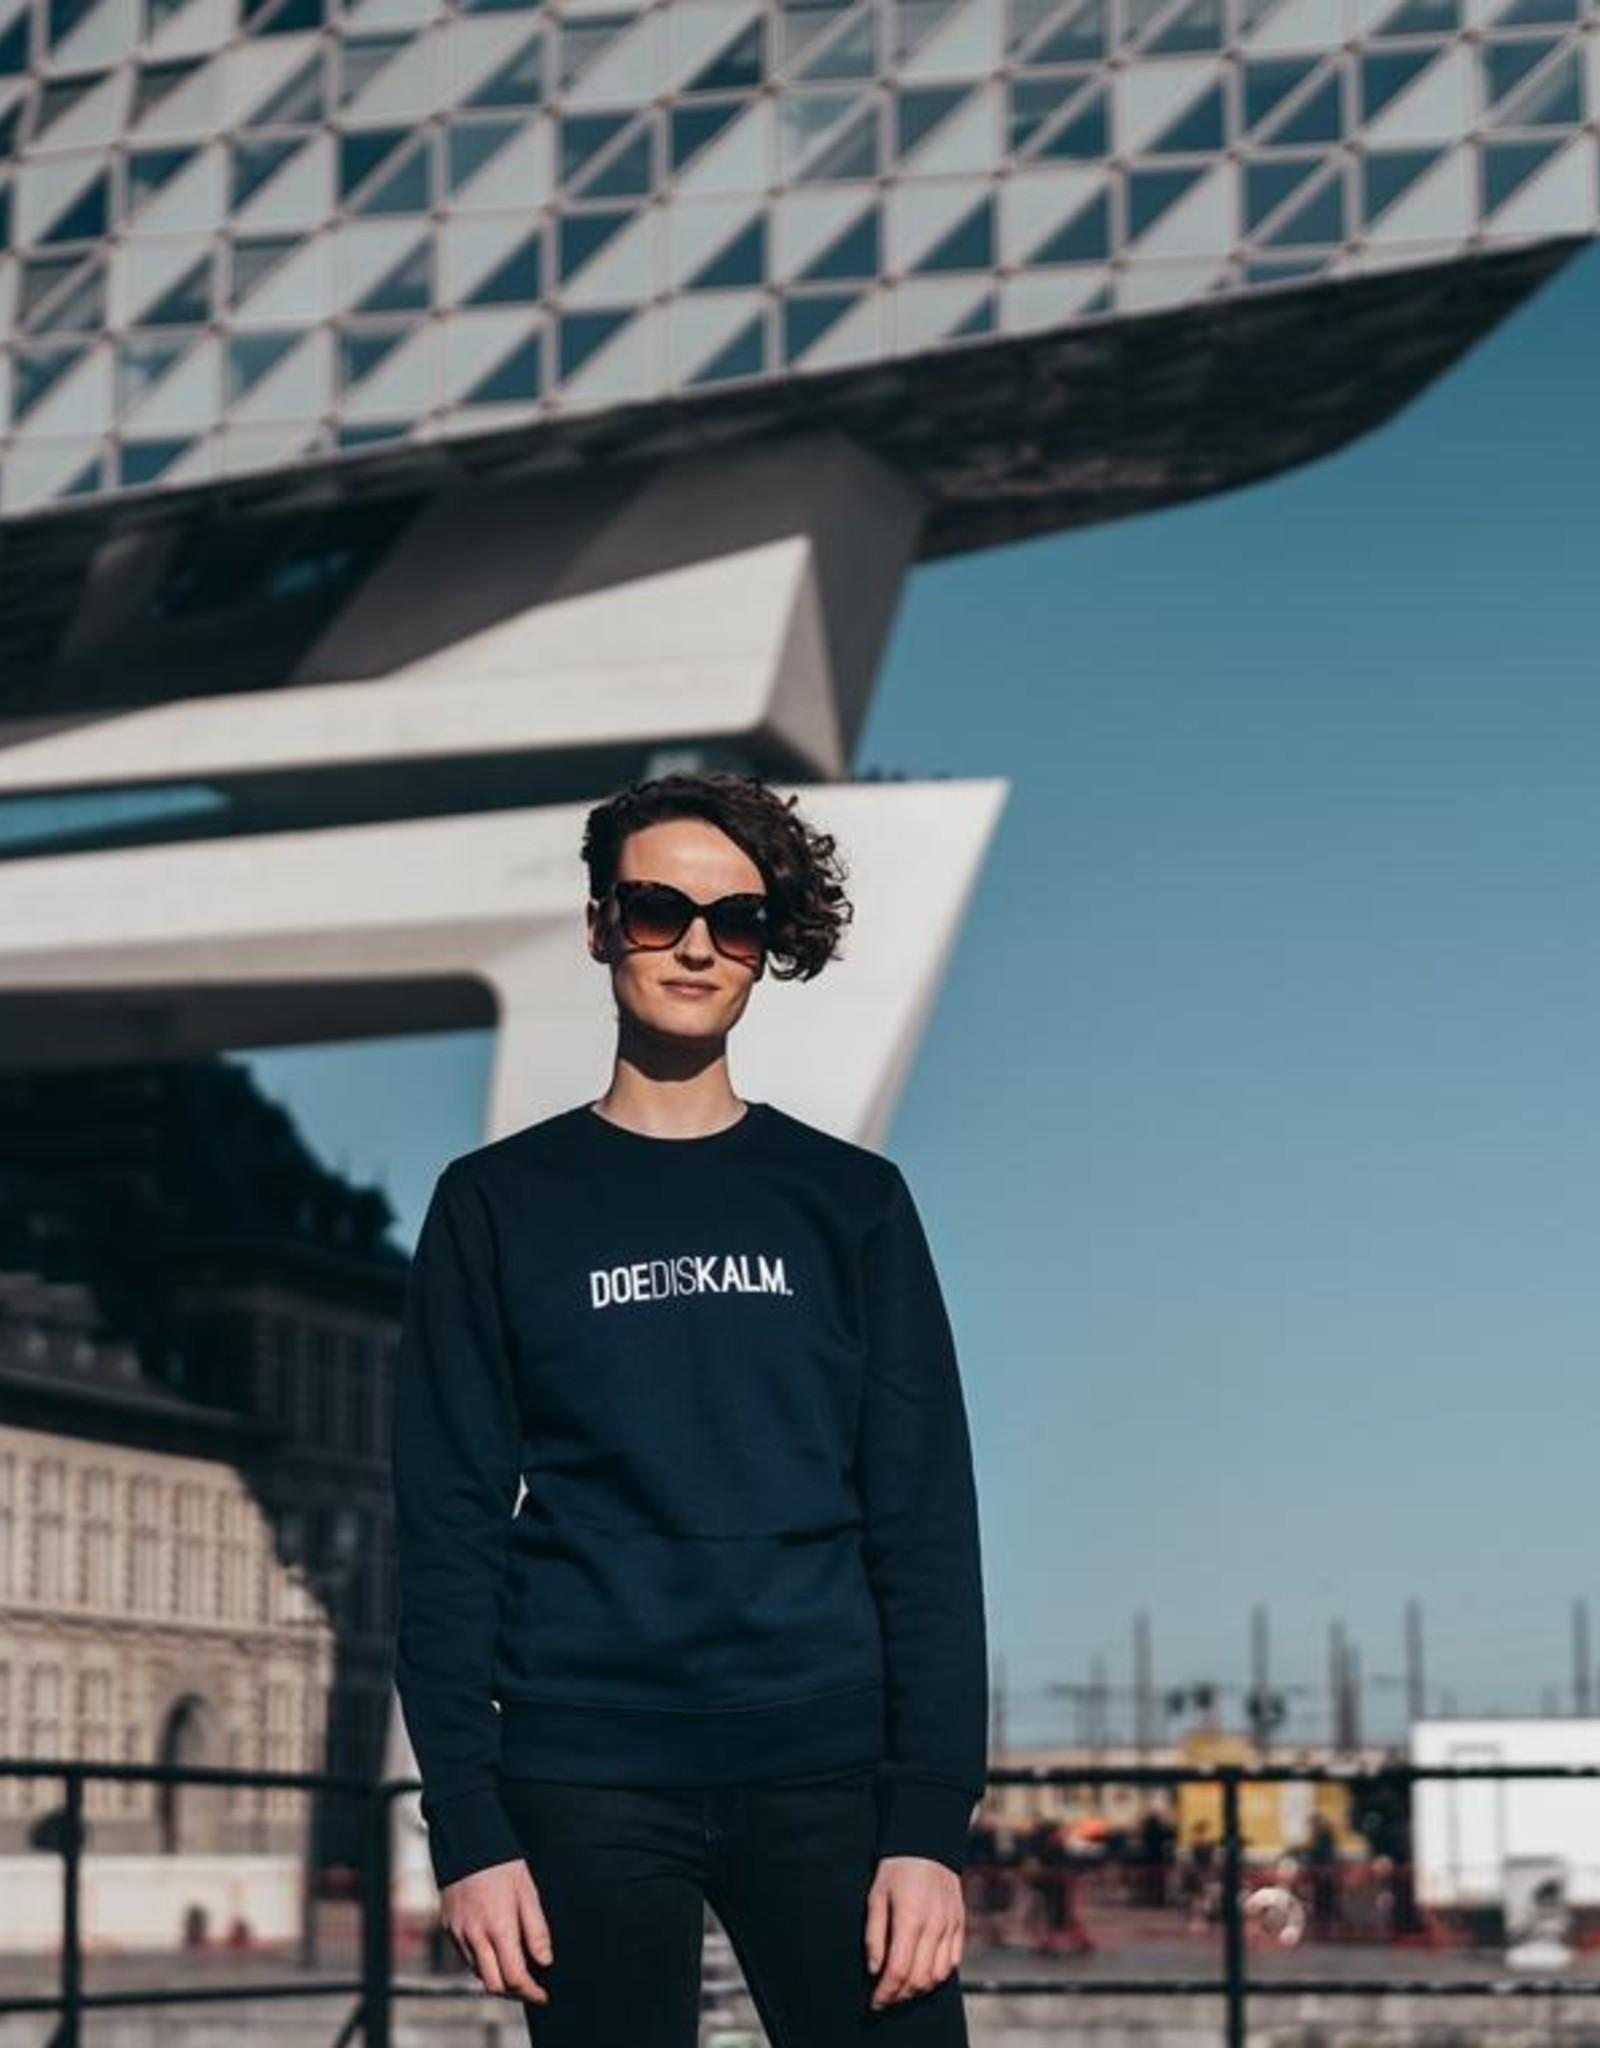 Kleir Sweater Biokatoen DOEDISKALM-blauw